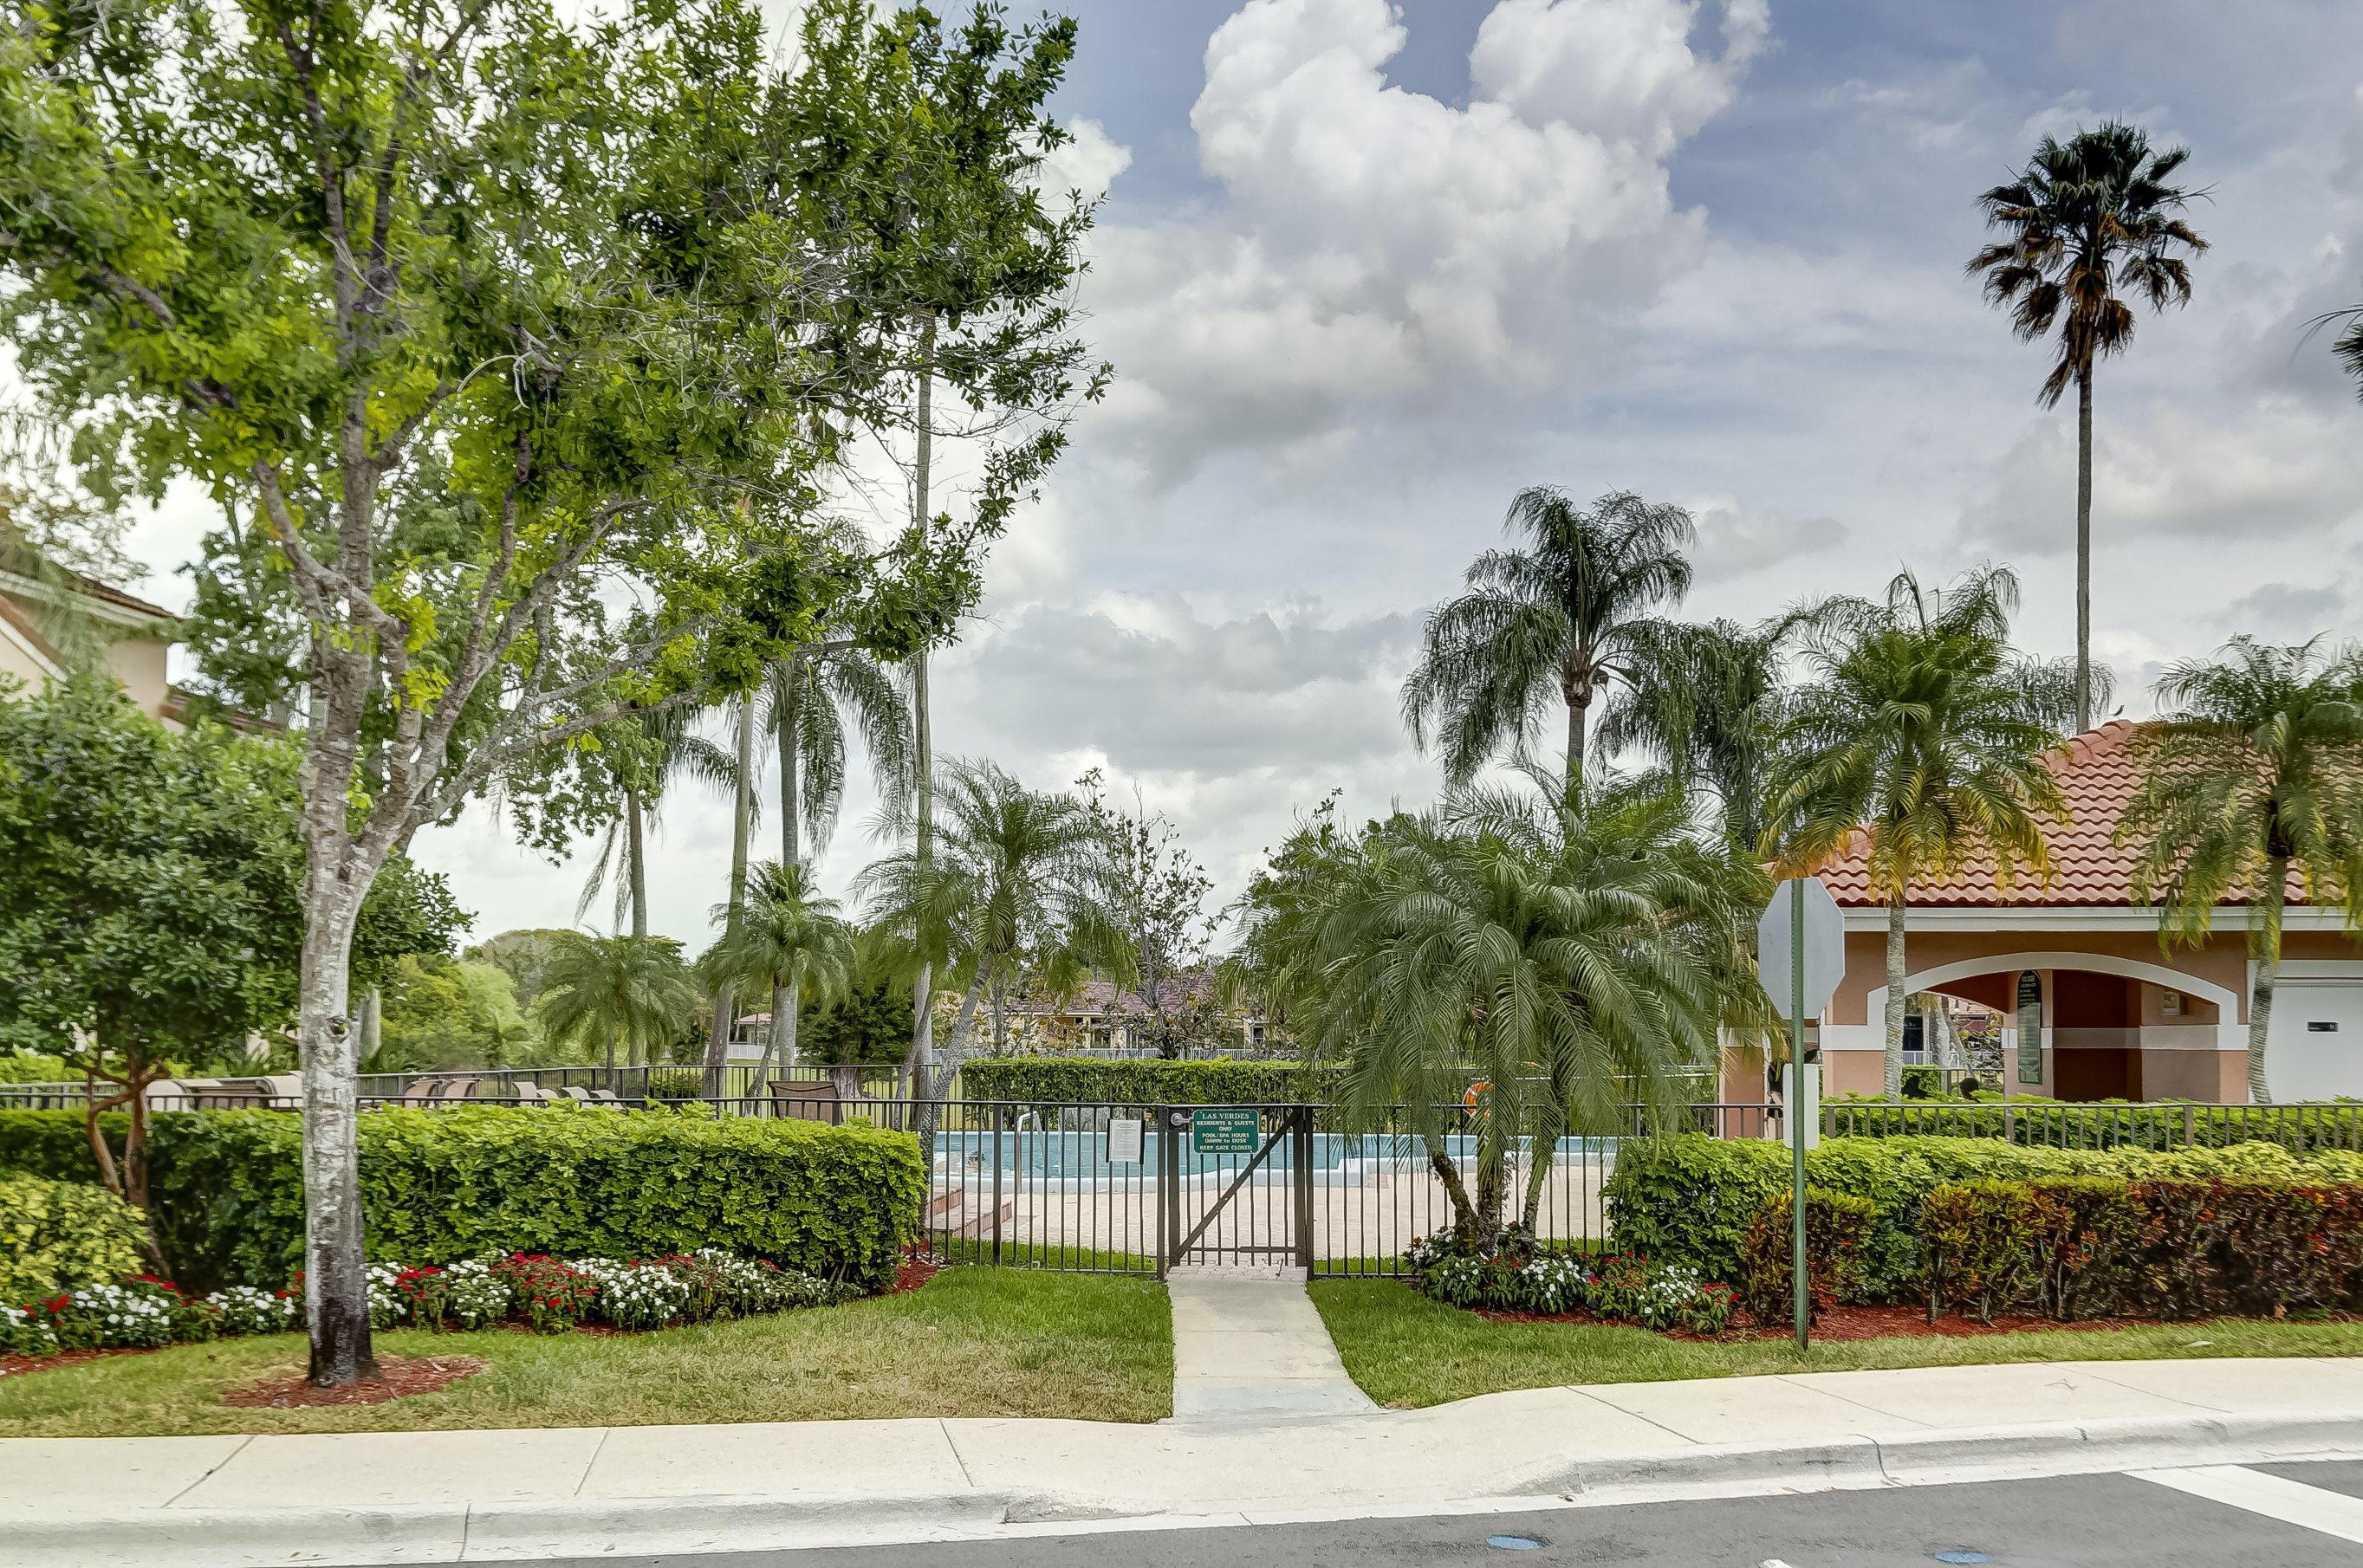 402 SW 158th Terrace 204 Pembroke Pines, FL 33027 photo 46